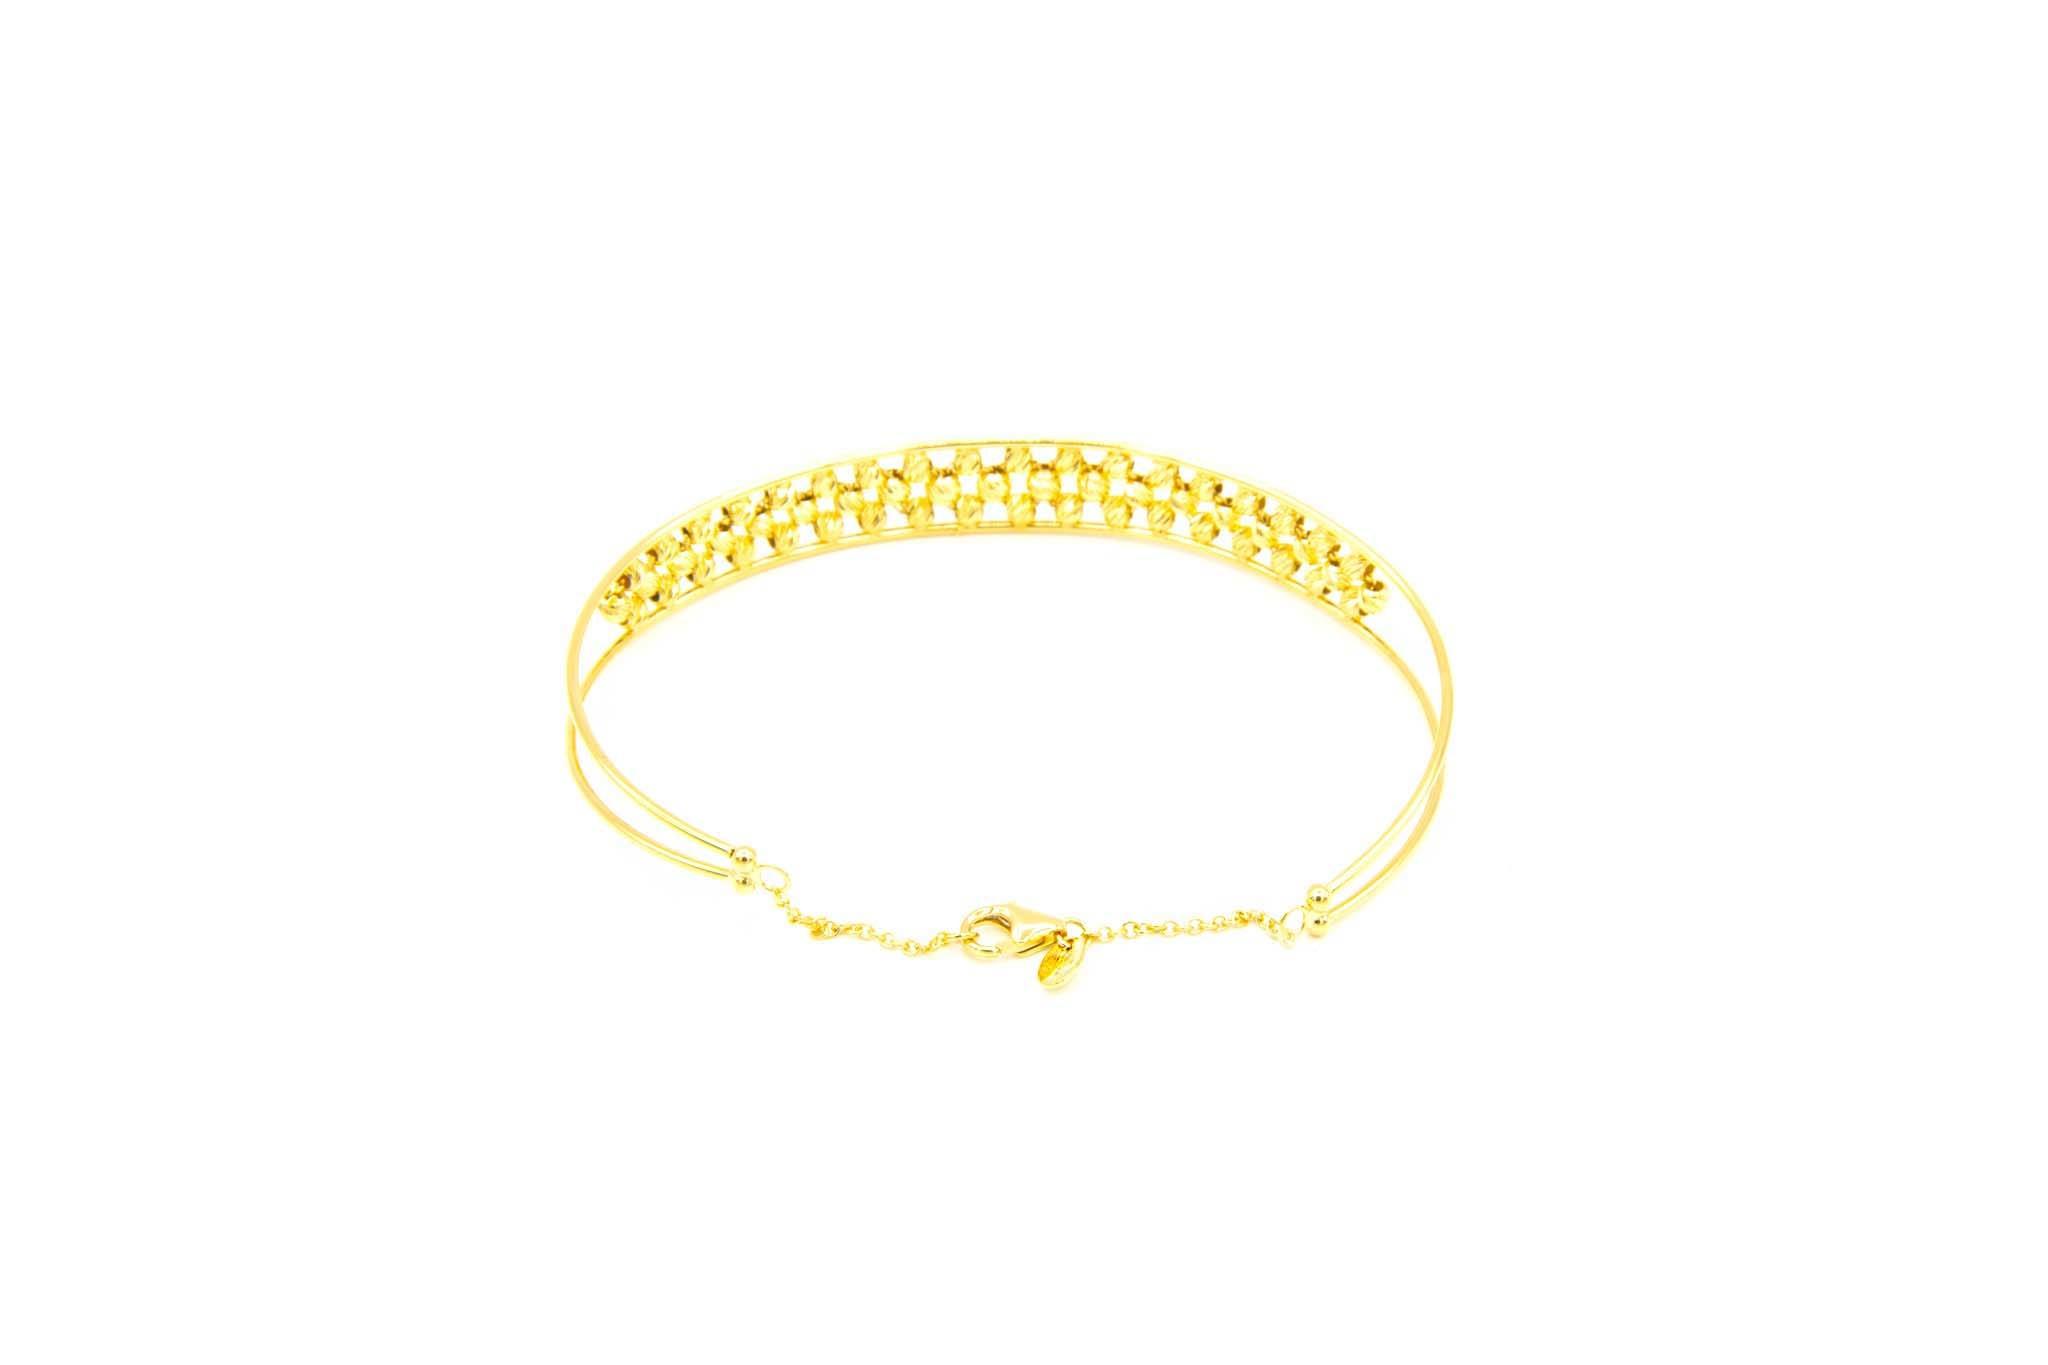 Armband opengewerkte band gevuld met diamond cut balletjes-3